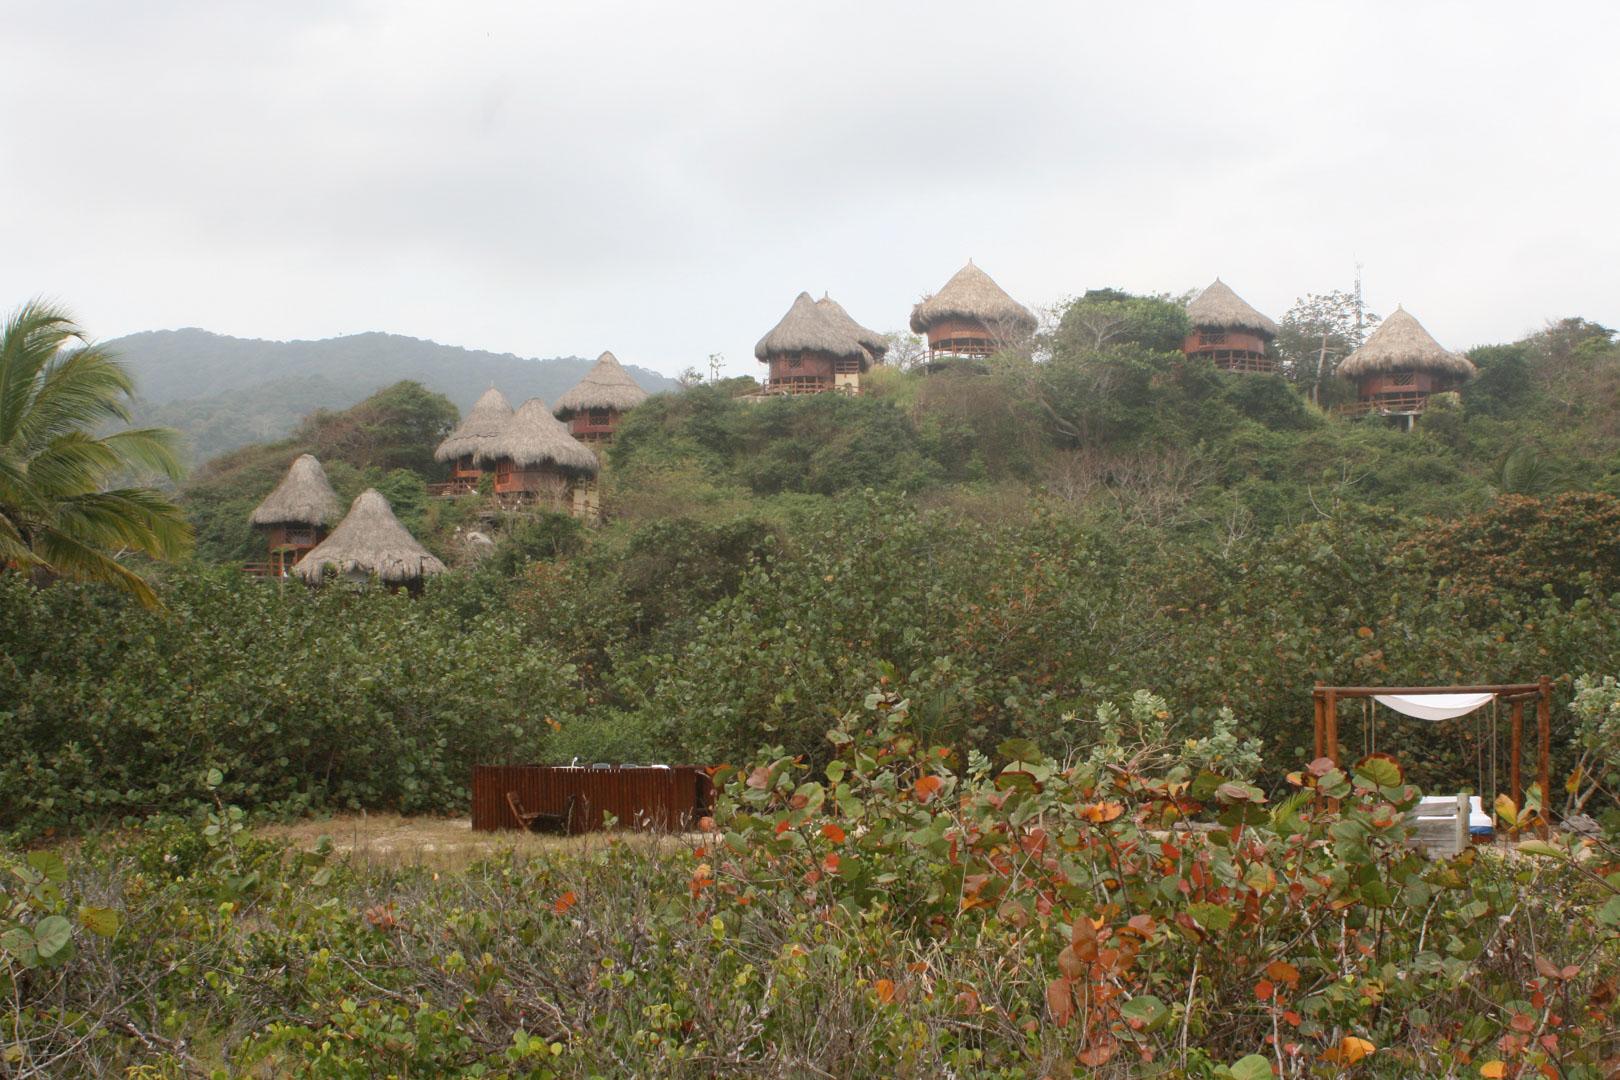 MF in Tayrona National Park, Colombia